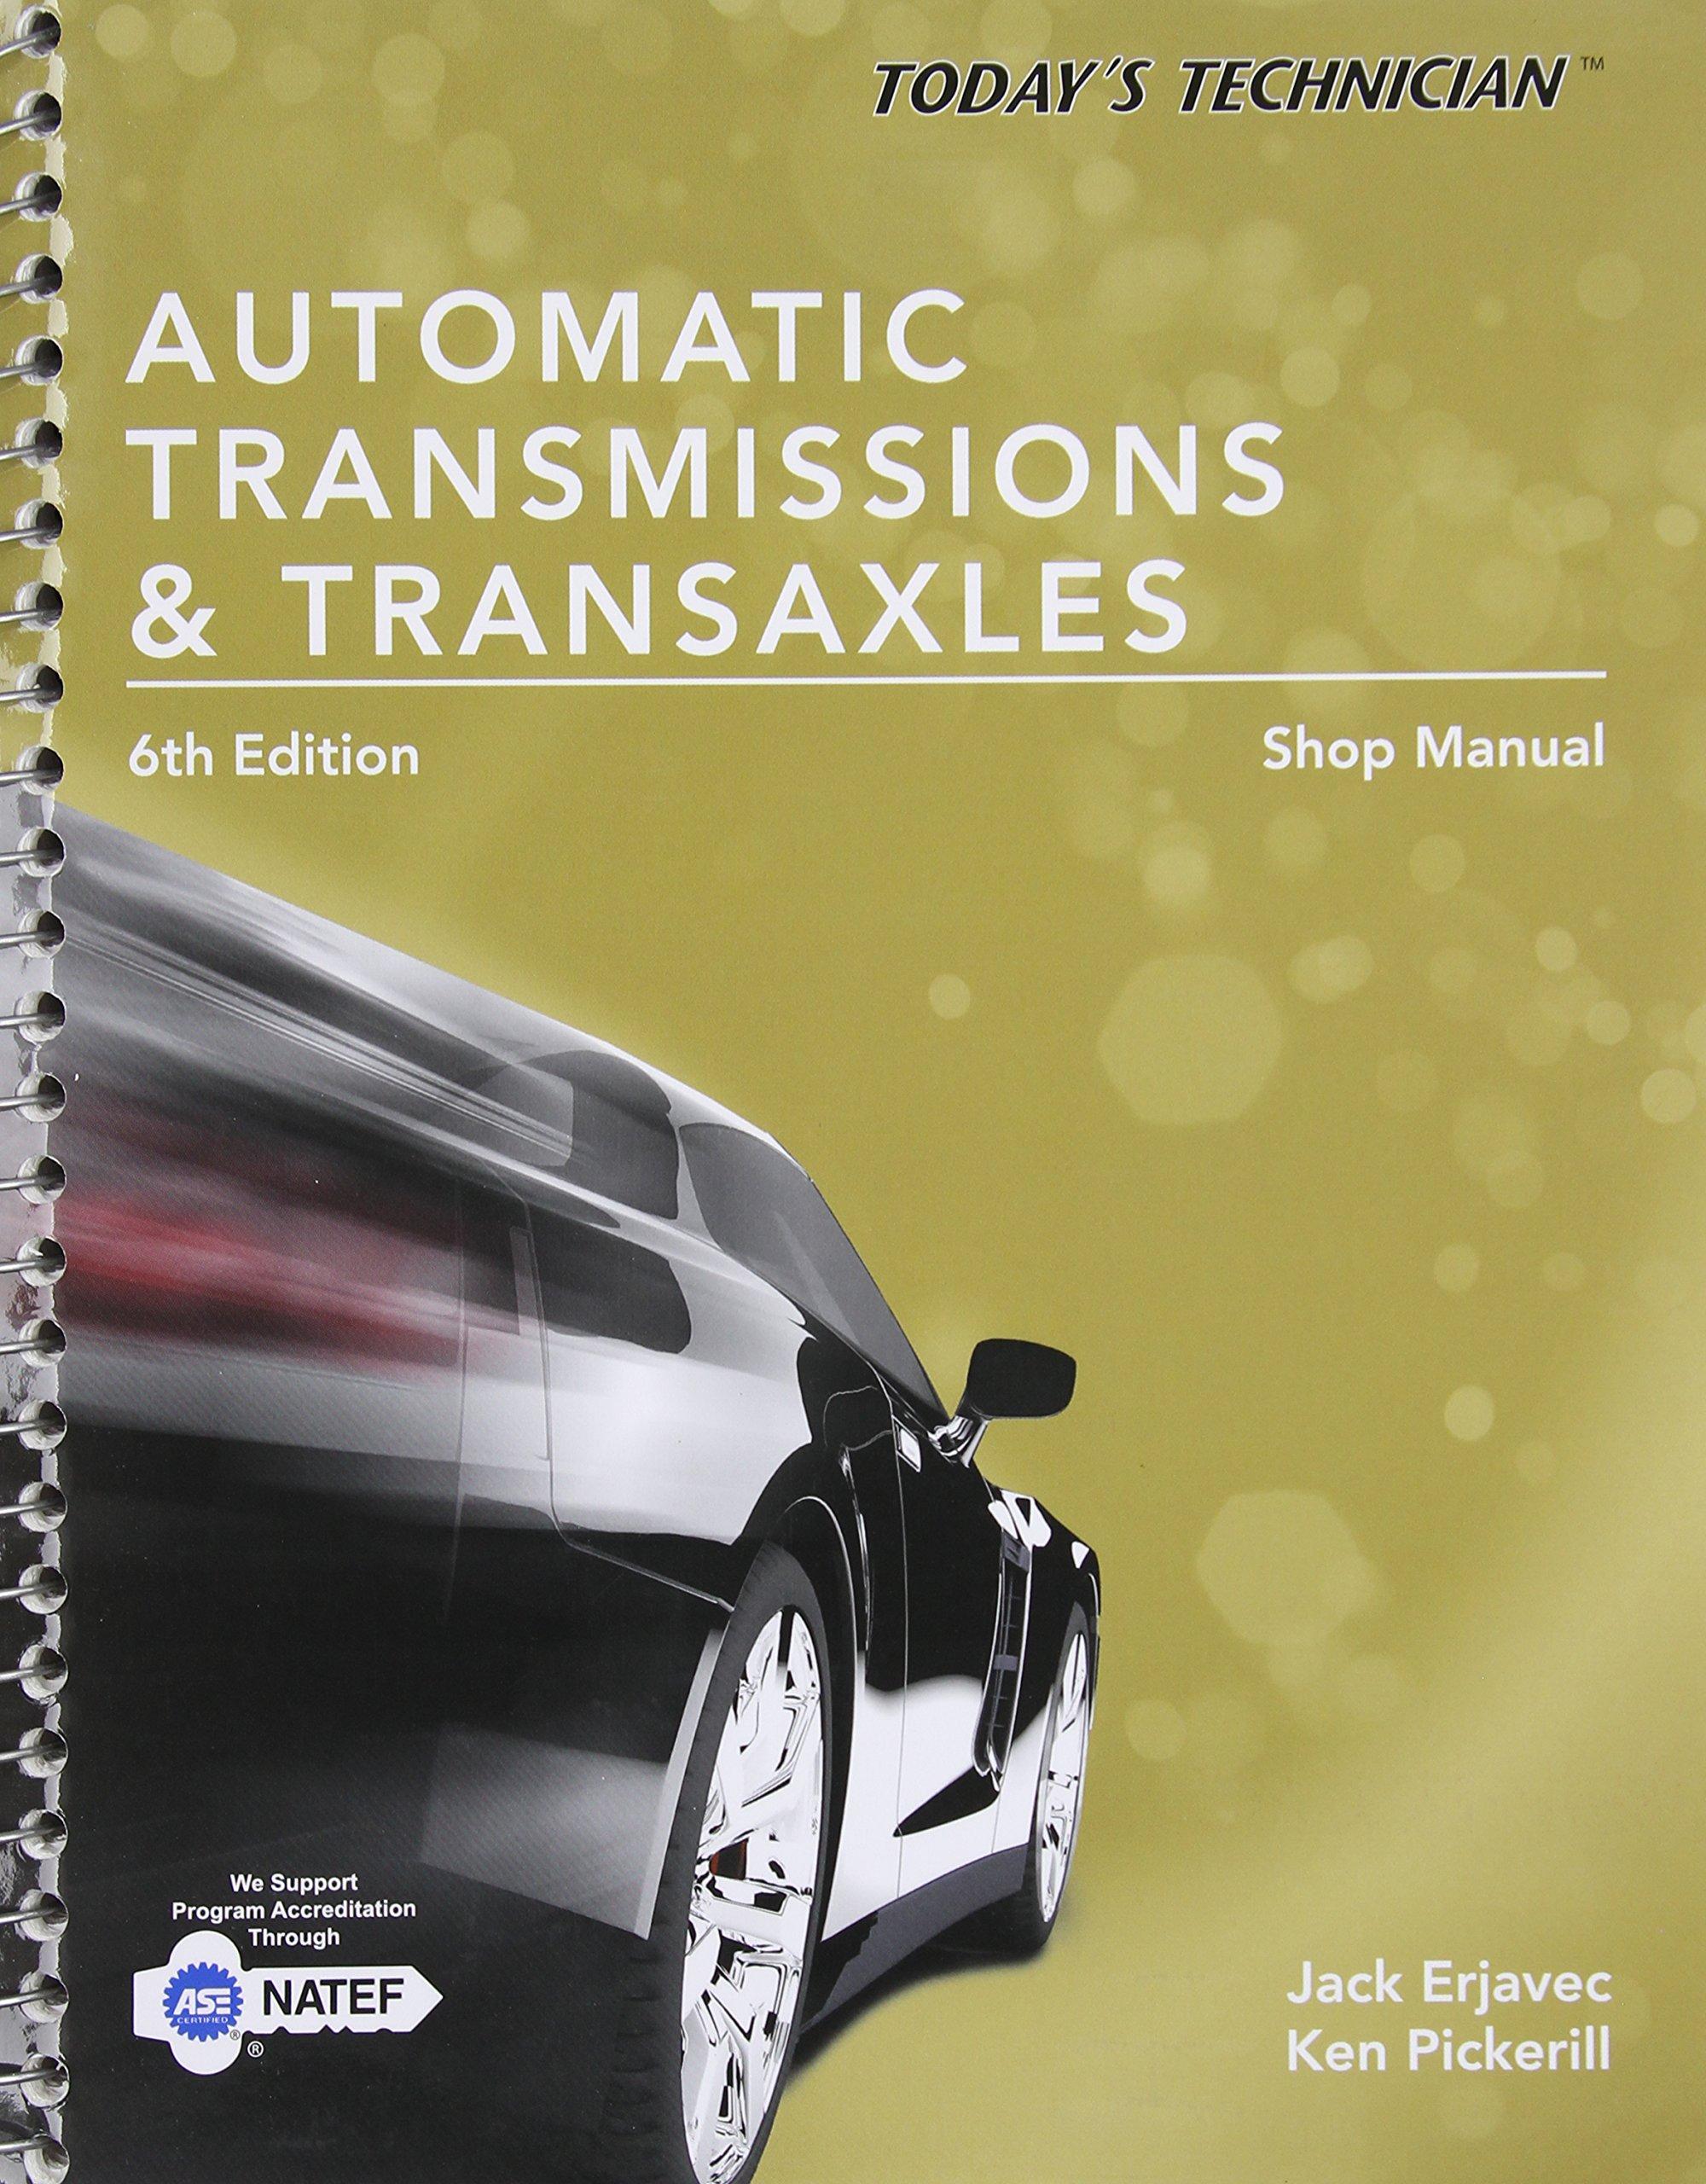 Today's Technician: Automatic Transmissions and Transaxles Shop Manual:  Jack Erjavec, Ken Pickerill: 9781305259362: Books - Amazon.ca